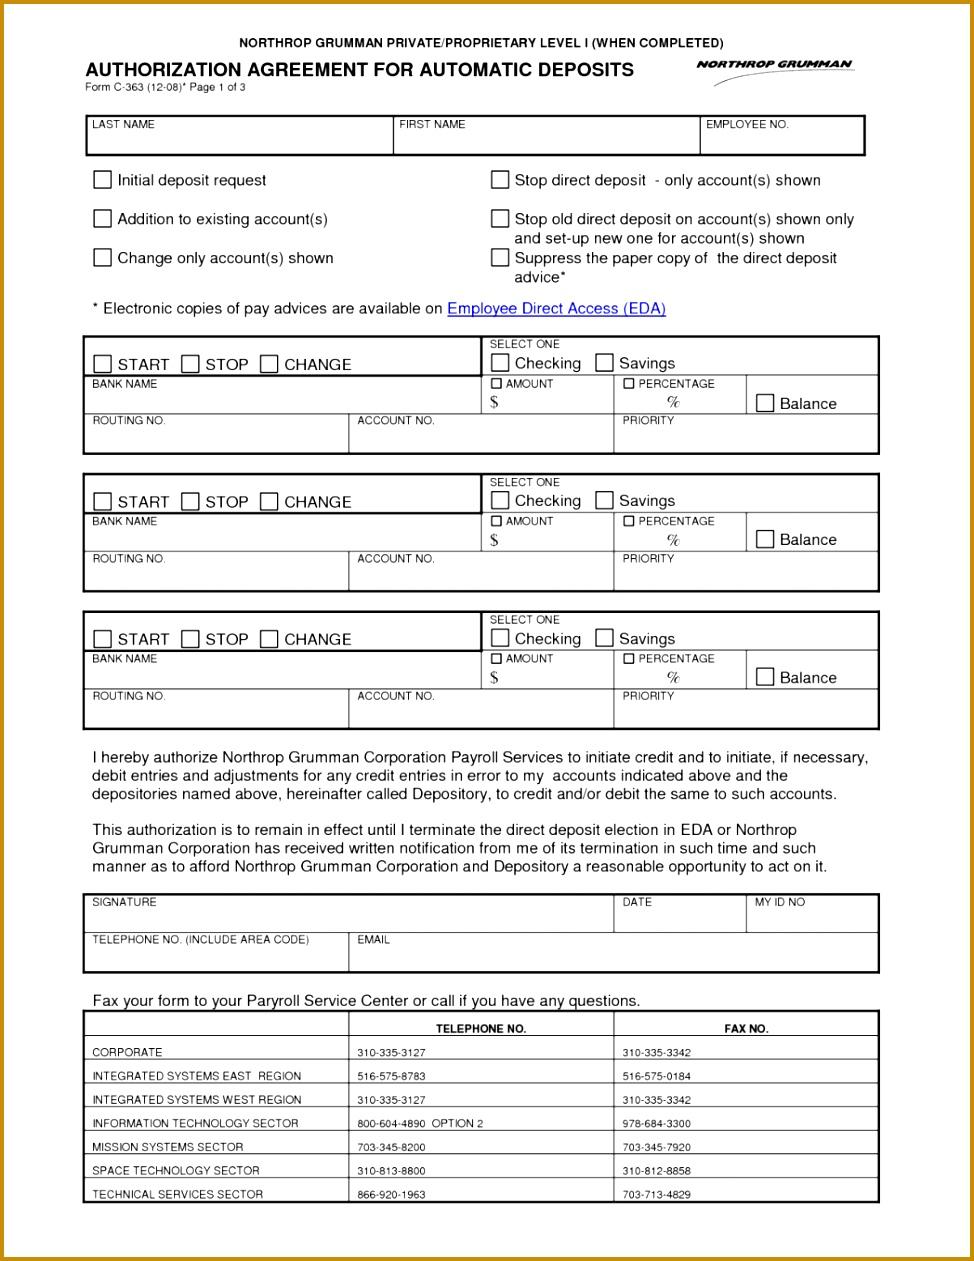 11 Wells Fargo Direct Deposit Authorization Form Pay Stub Template 228 9741261